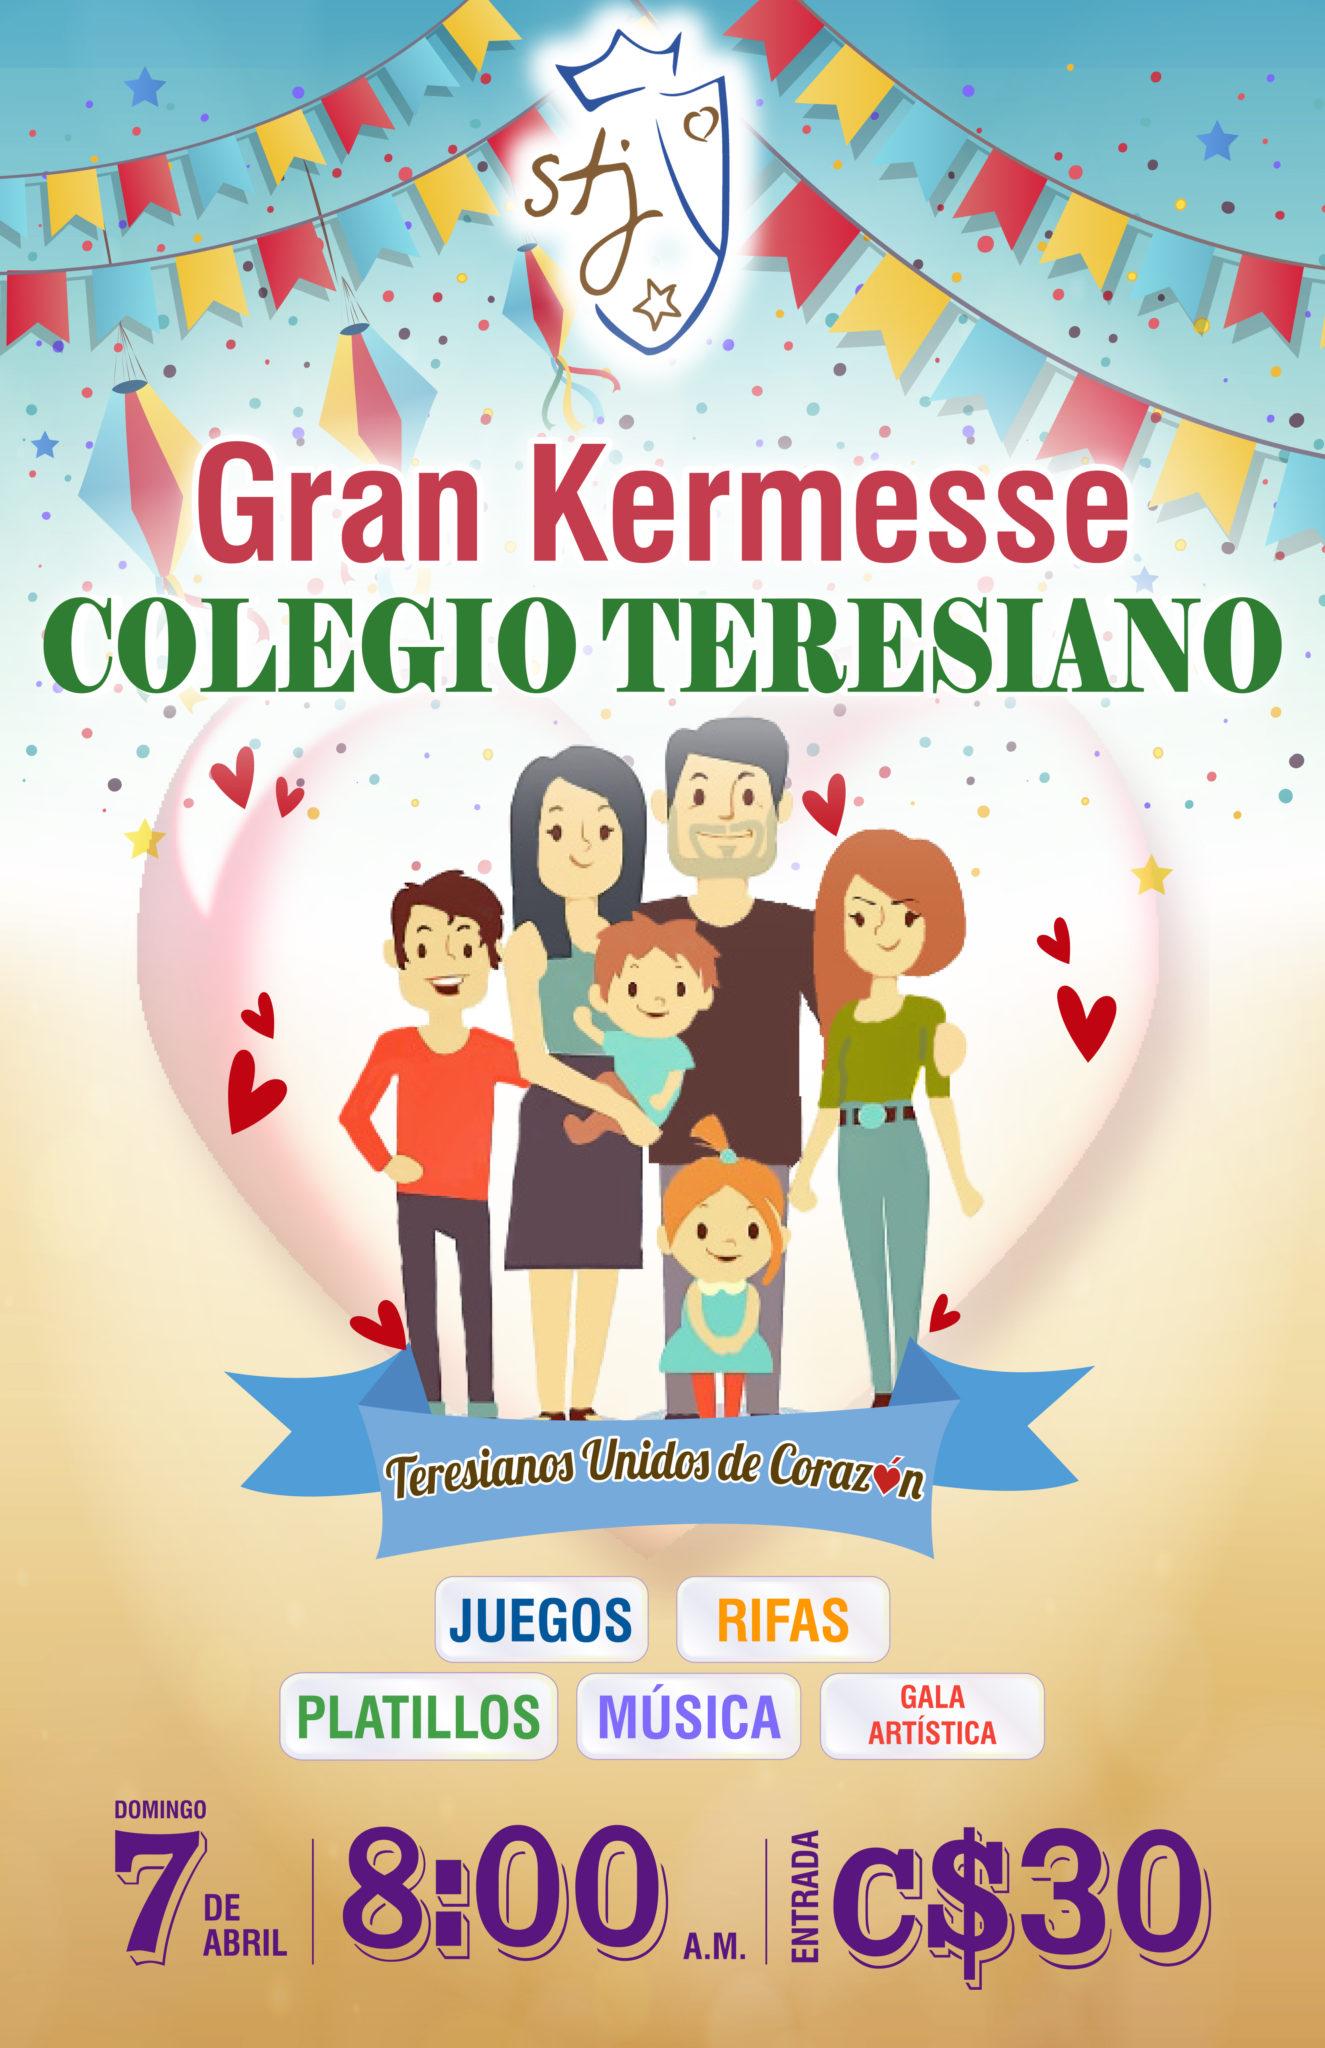 KERMESSE TERESIANA – TERESIANOS DE CORAZÓN * GREAT TERESIAN KERMESSE 2019!